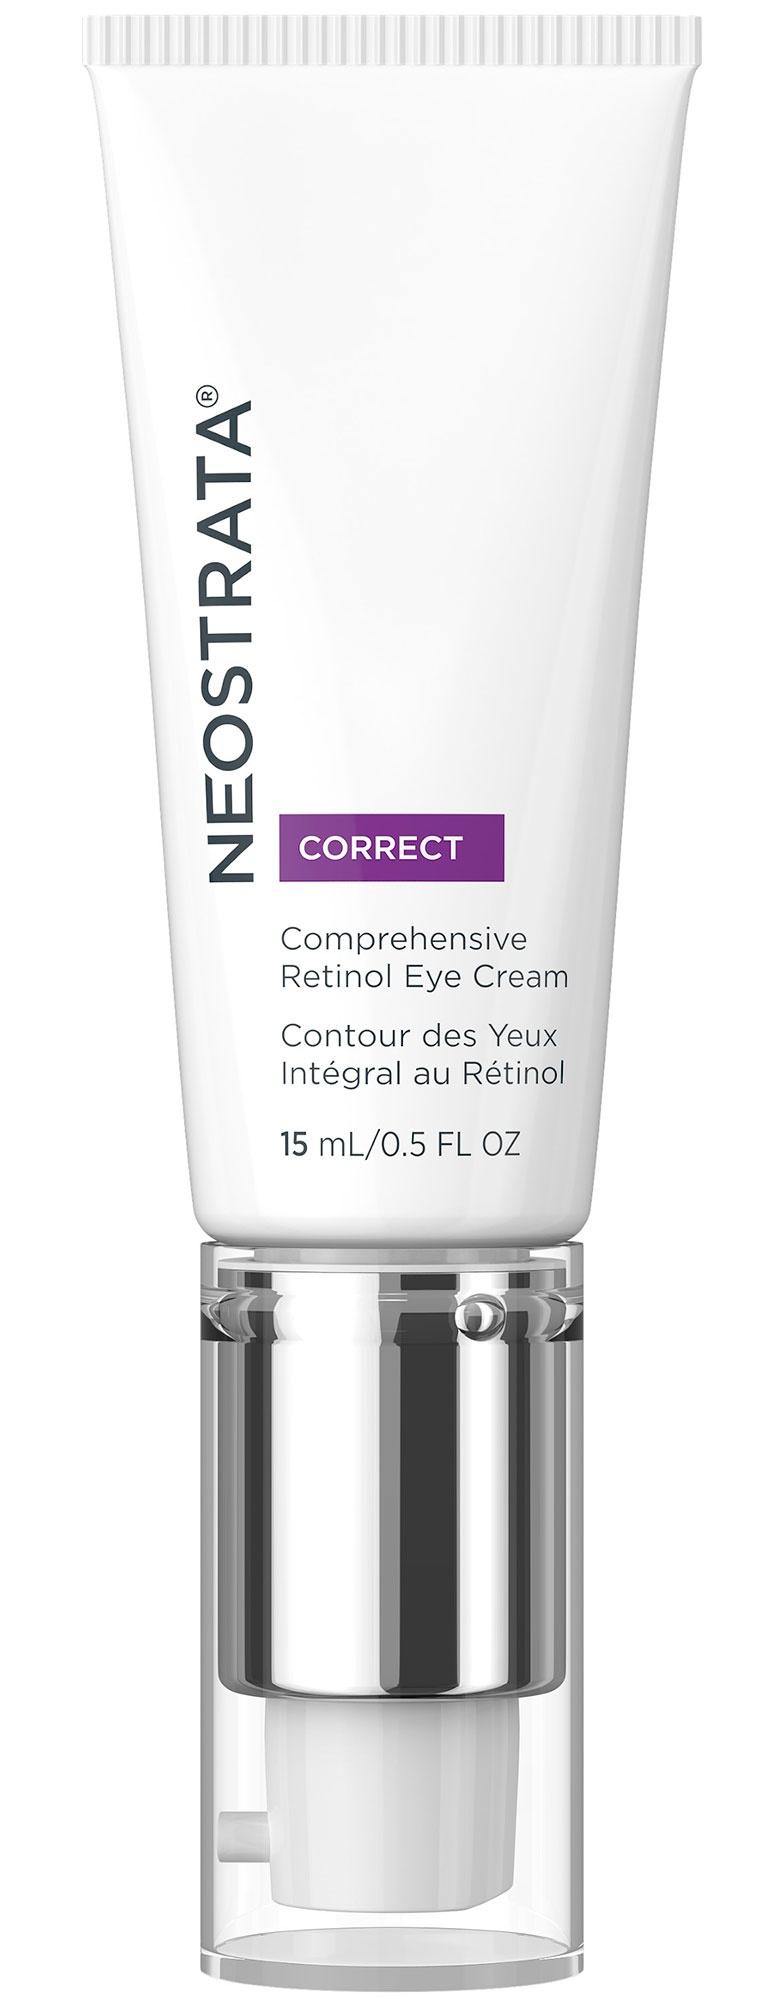 Neostrata Comprehensive Retinol Eye Cream